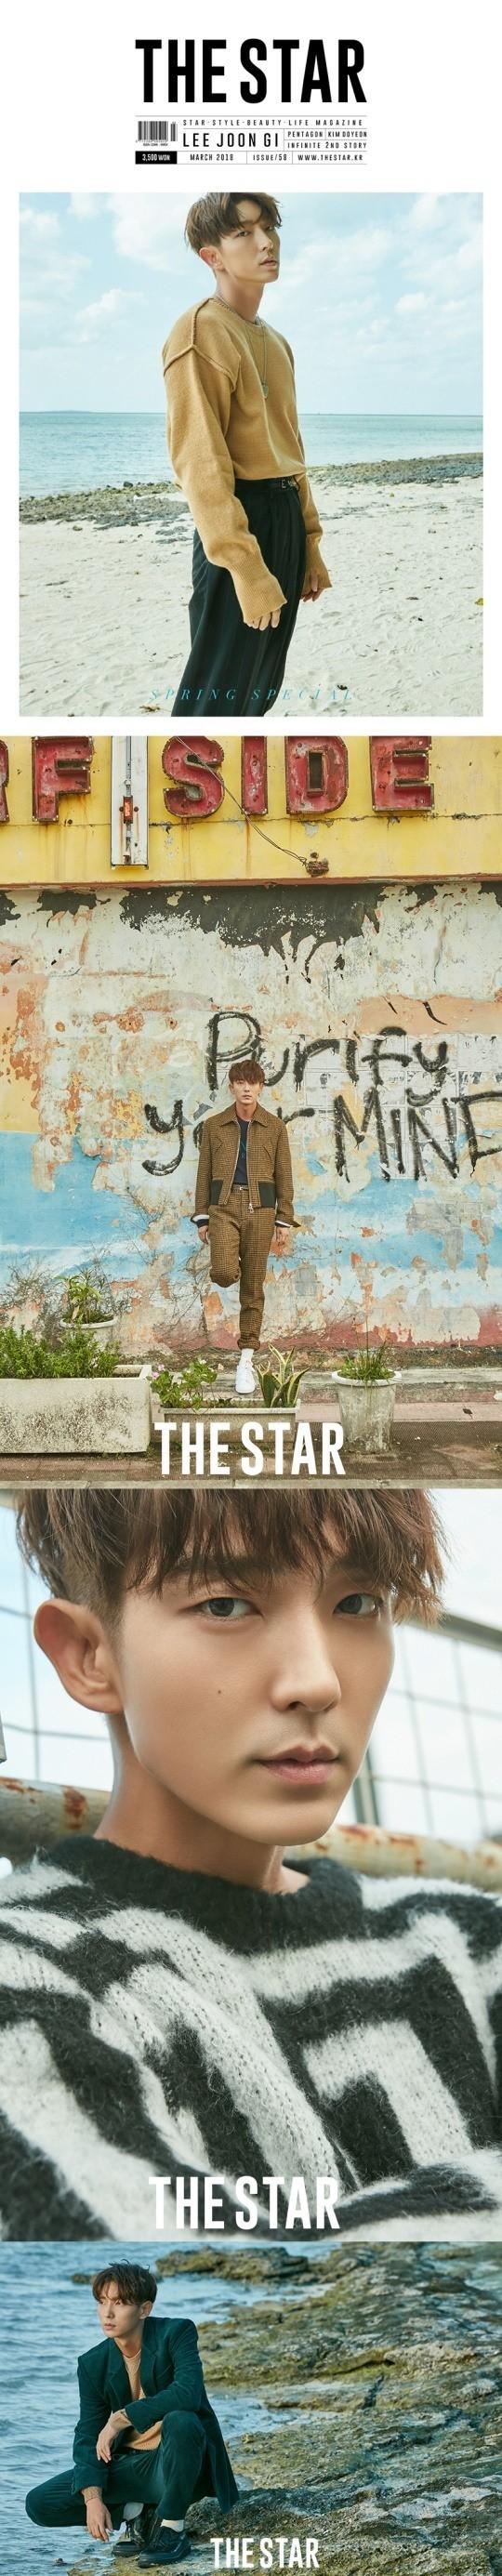 THE STAR イ・ジュンギ